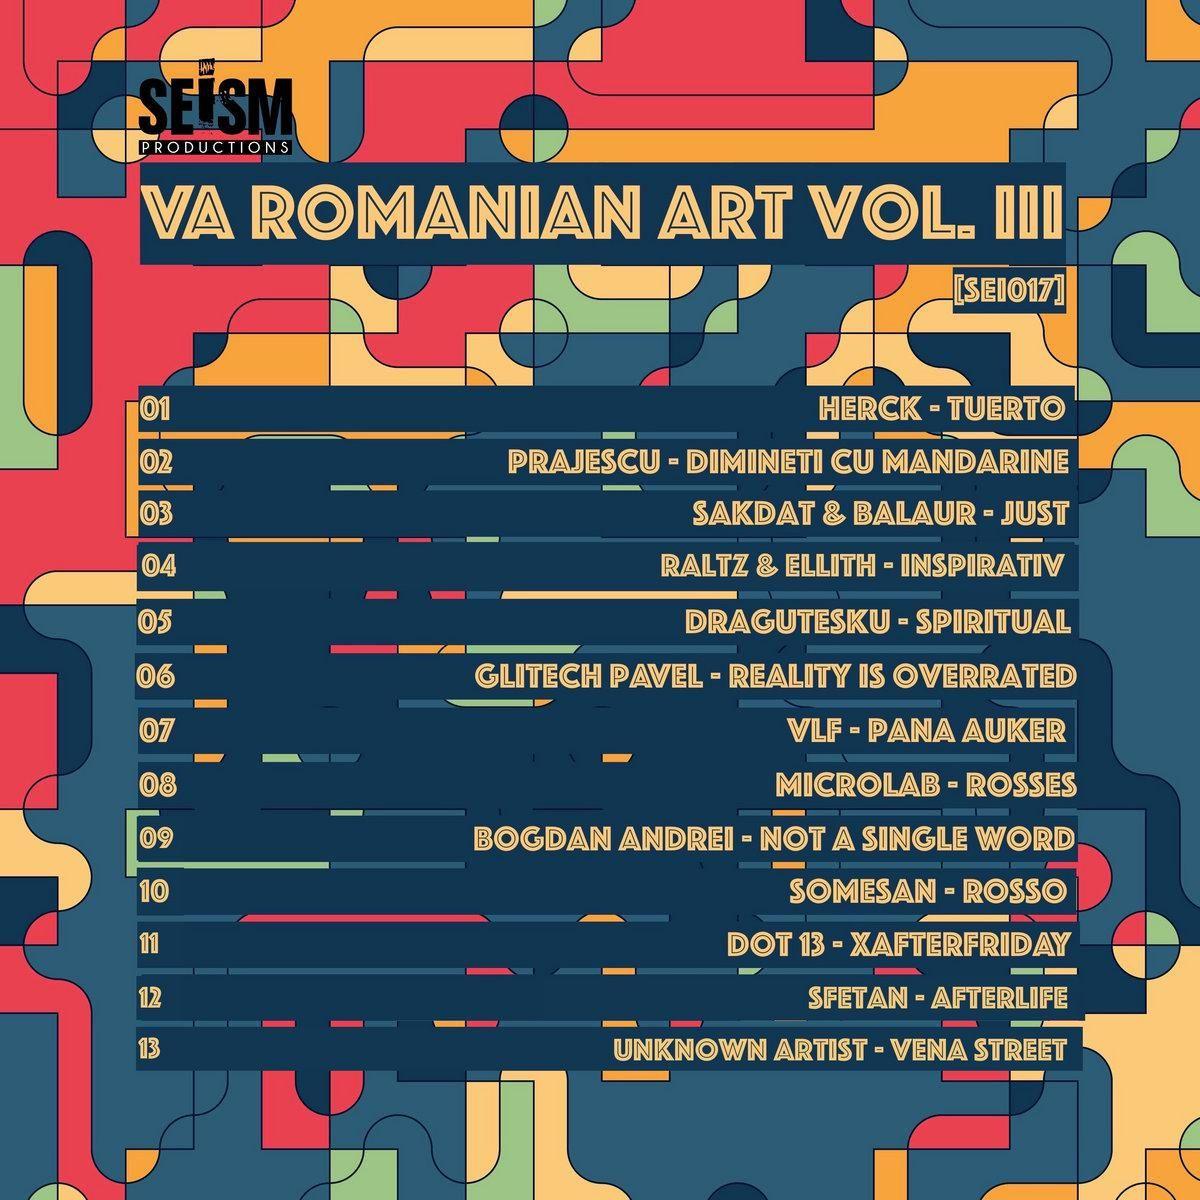 VA VA Romanian Art Vol. III / SEI017 in 2020 Single